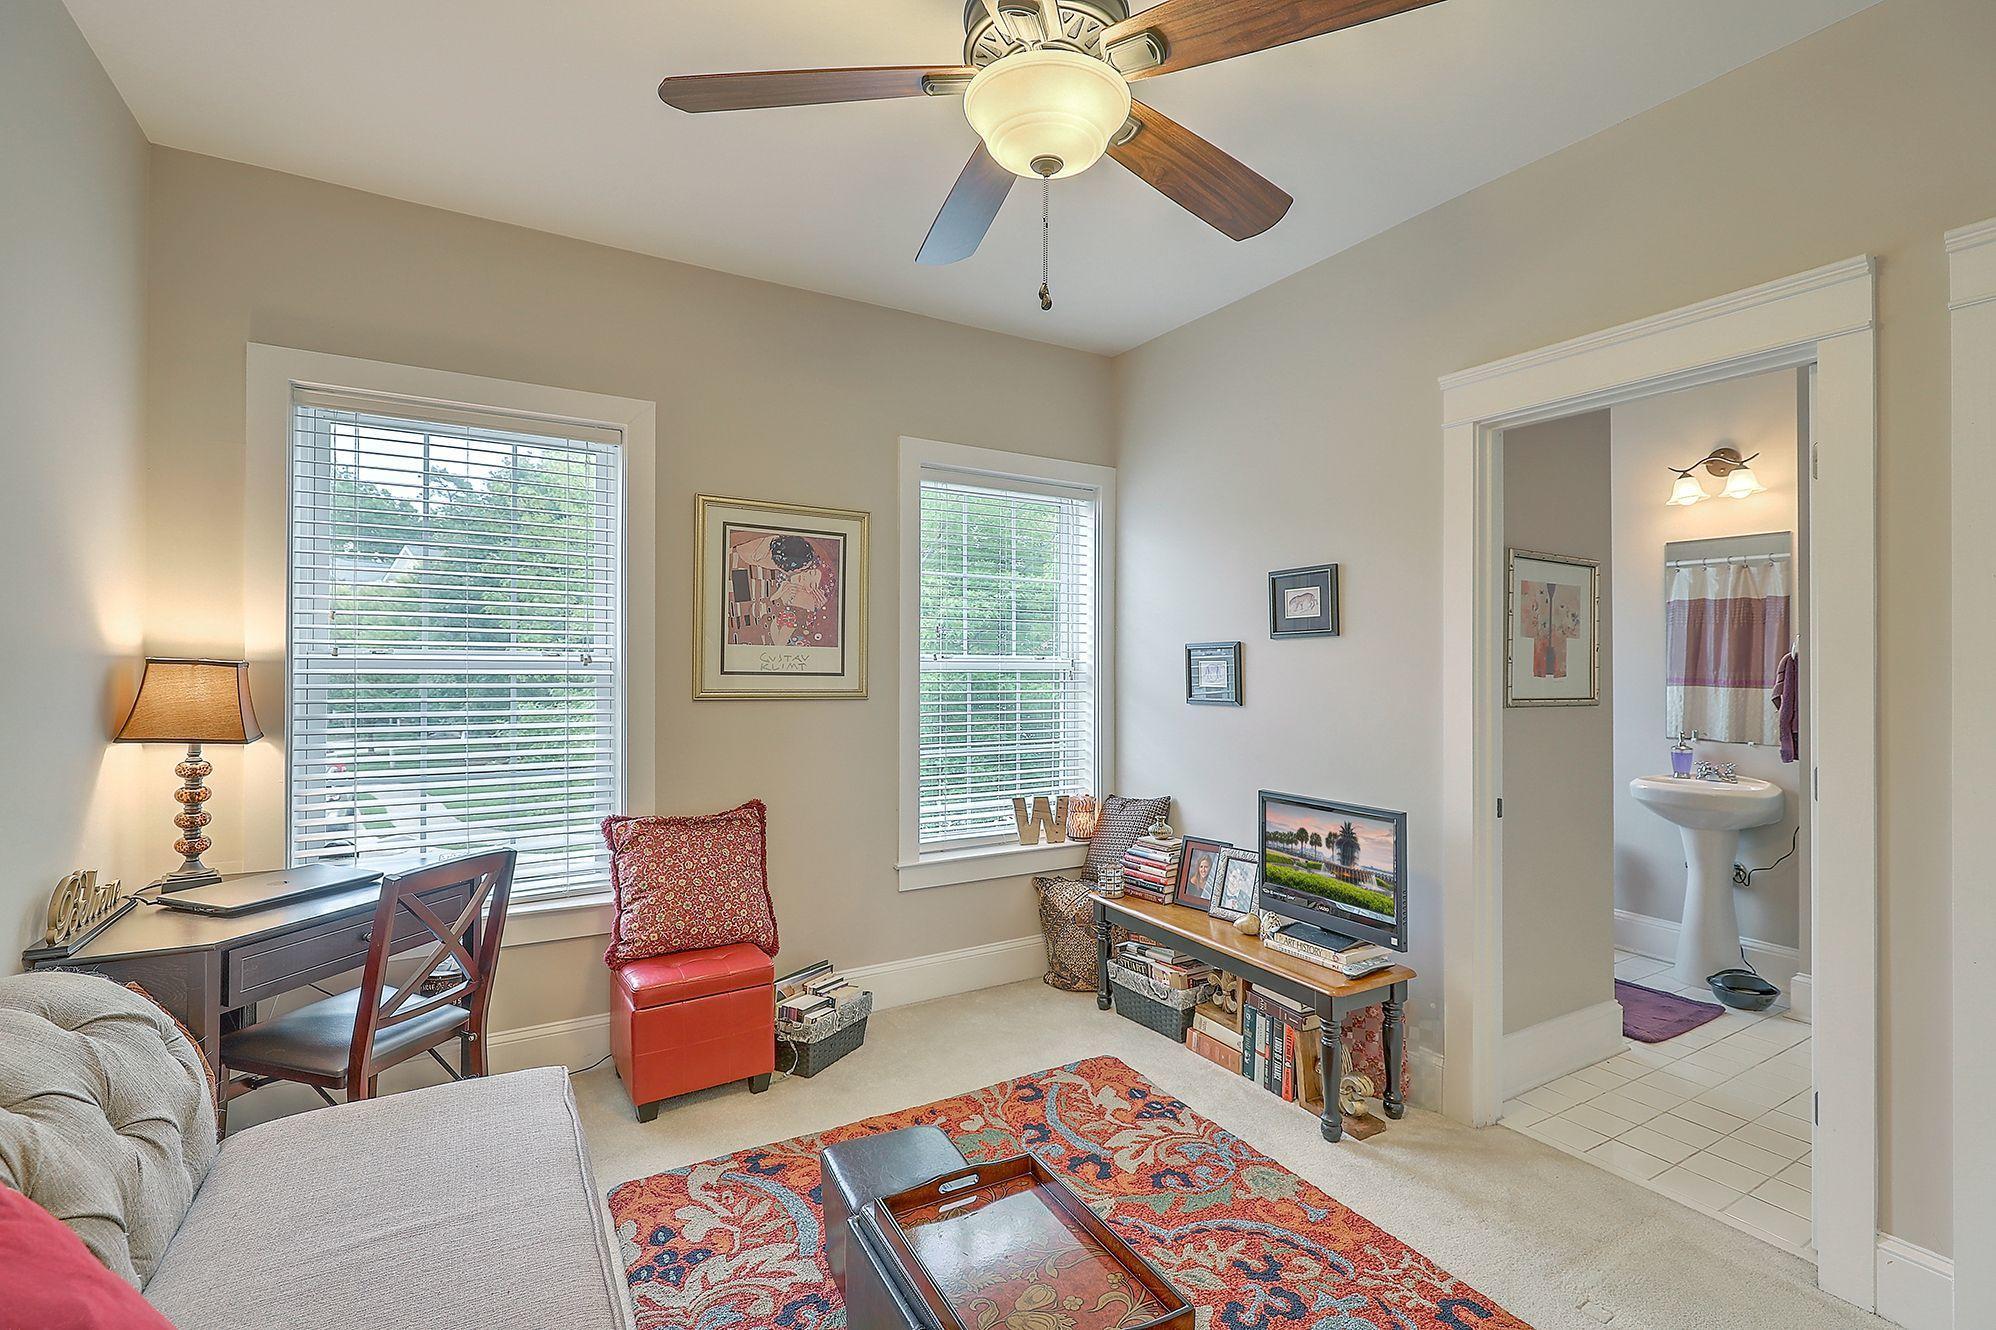 Etiwan Pointe Homes For Sale - 208 Etiwan Pointe, Mount Pleasant, SC - 41